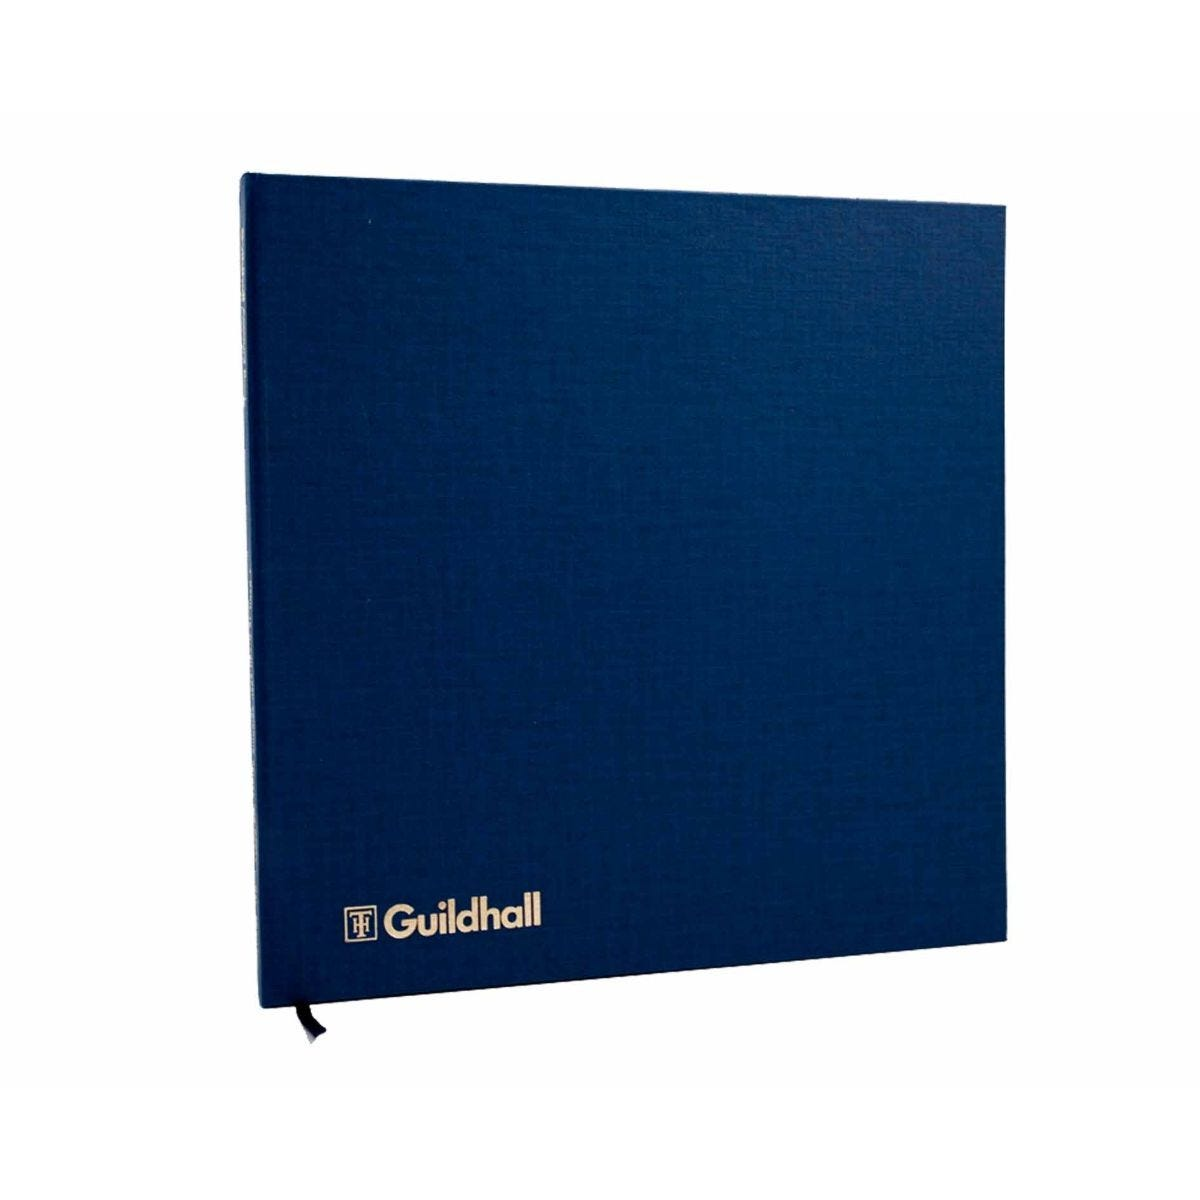 Guildhall Account Book 51 Series 4 Debit 16 Credit Columns